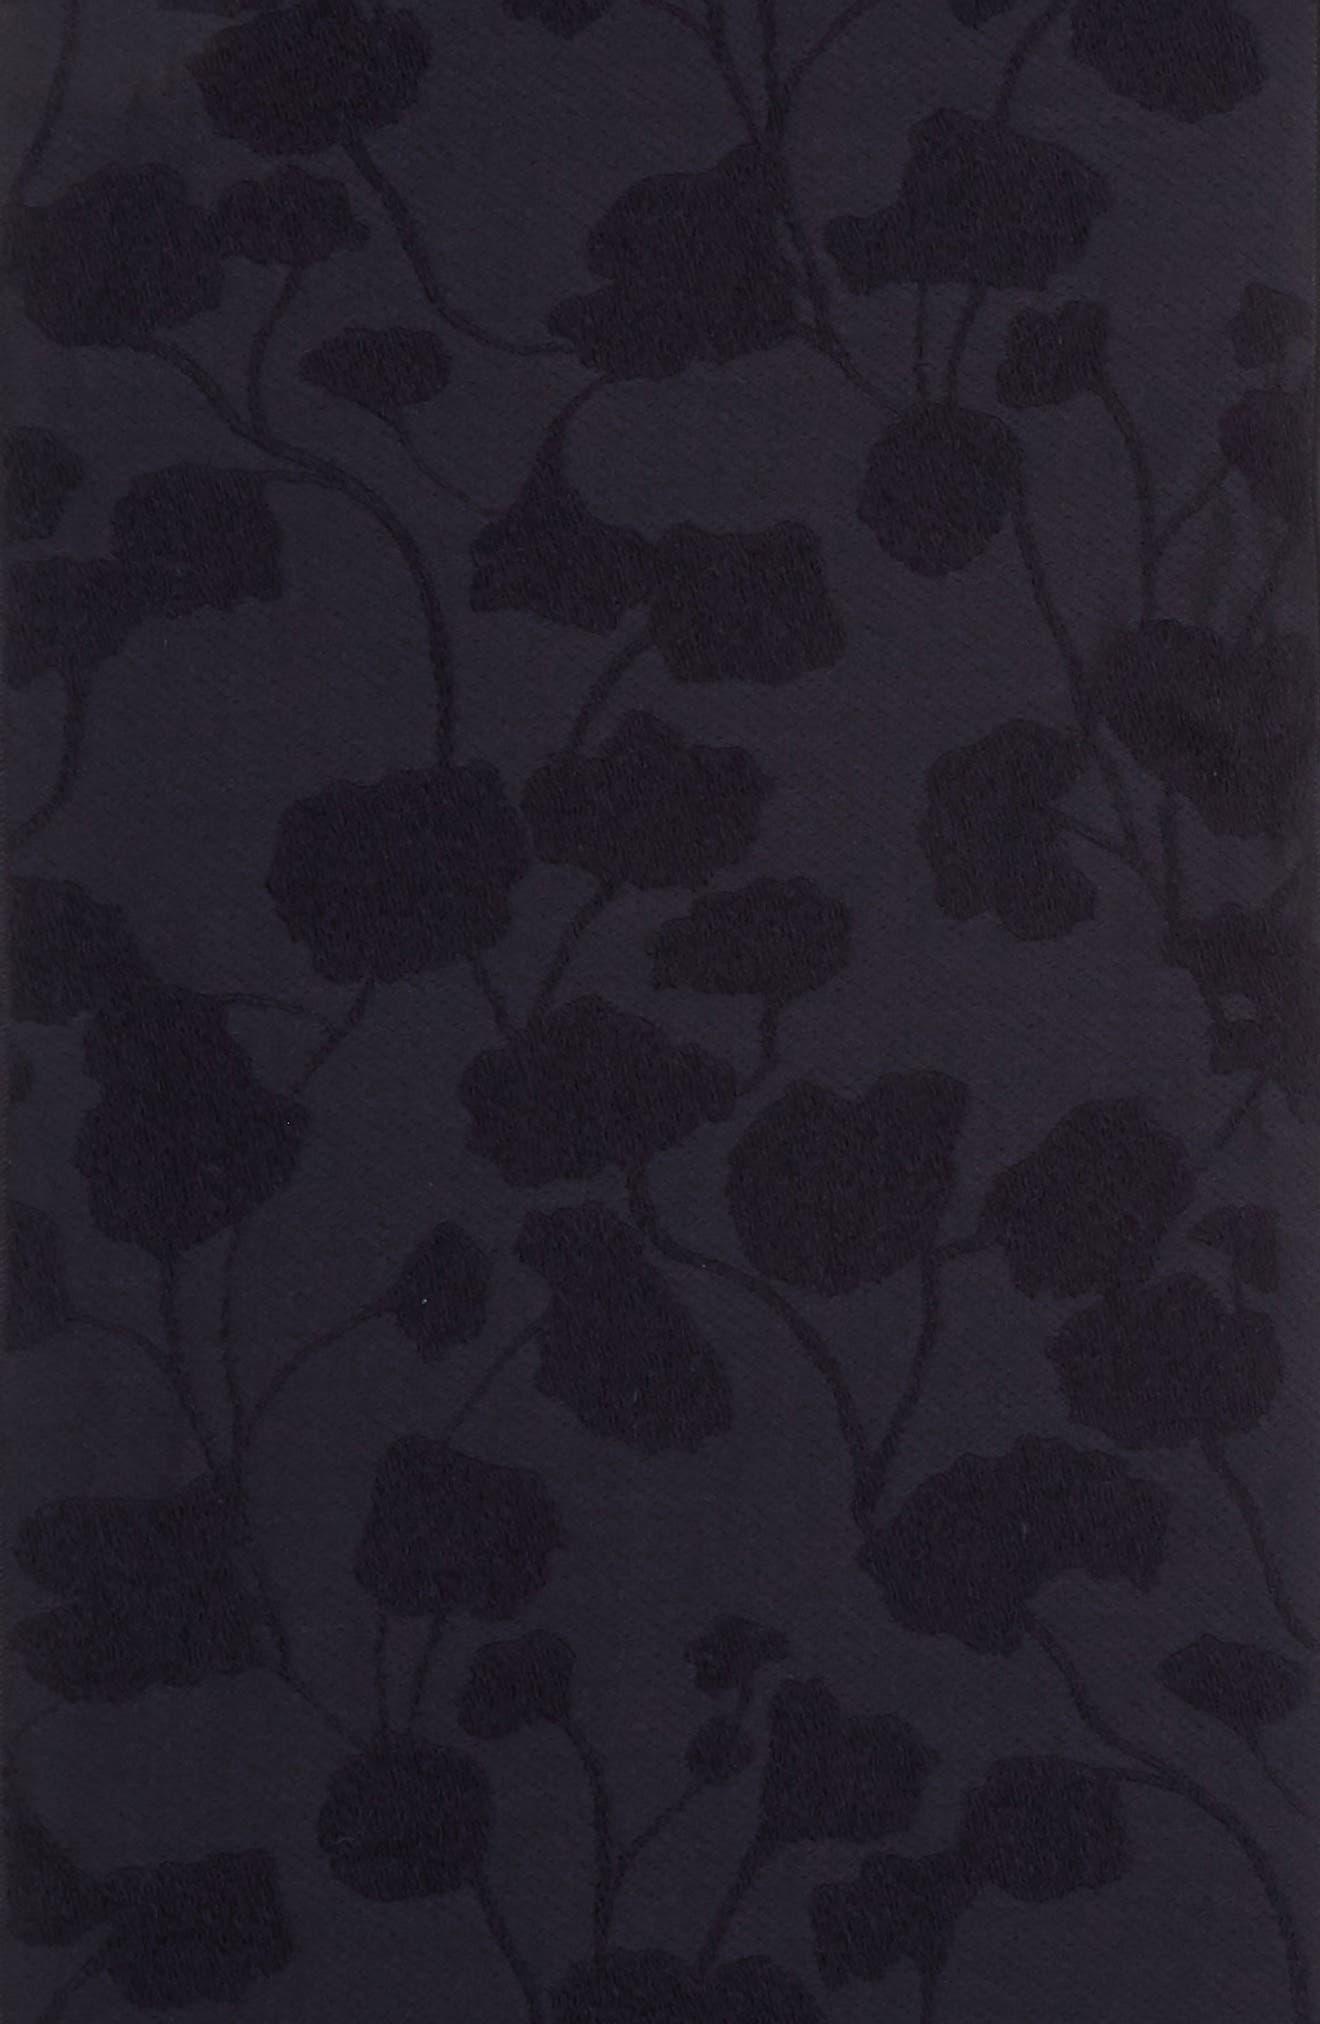 Alternate Image 3  - Armani Collezioni Floral Jacquard Scarf